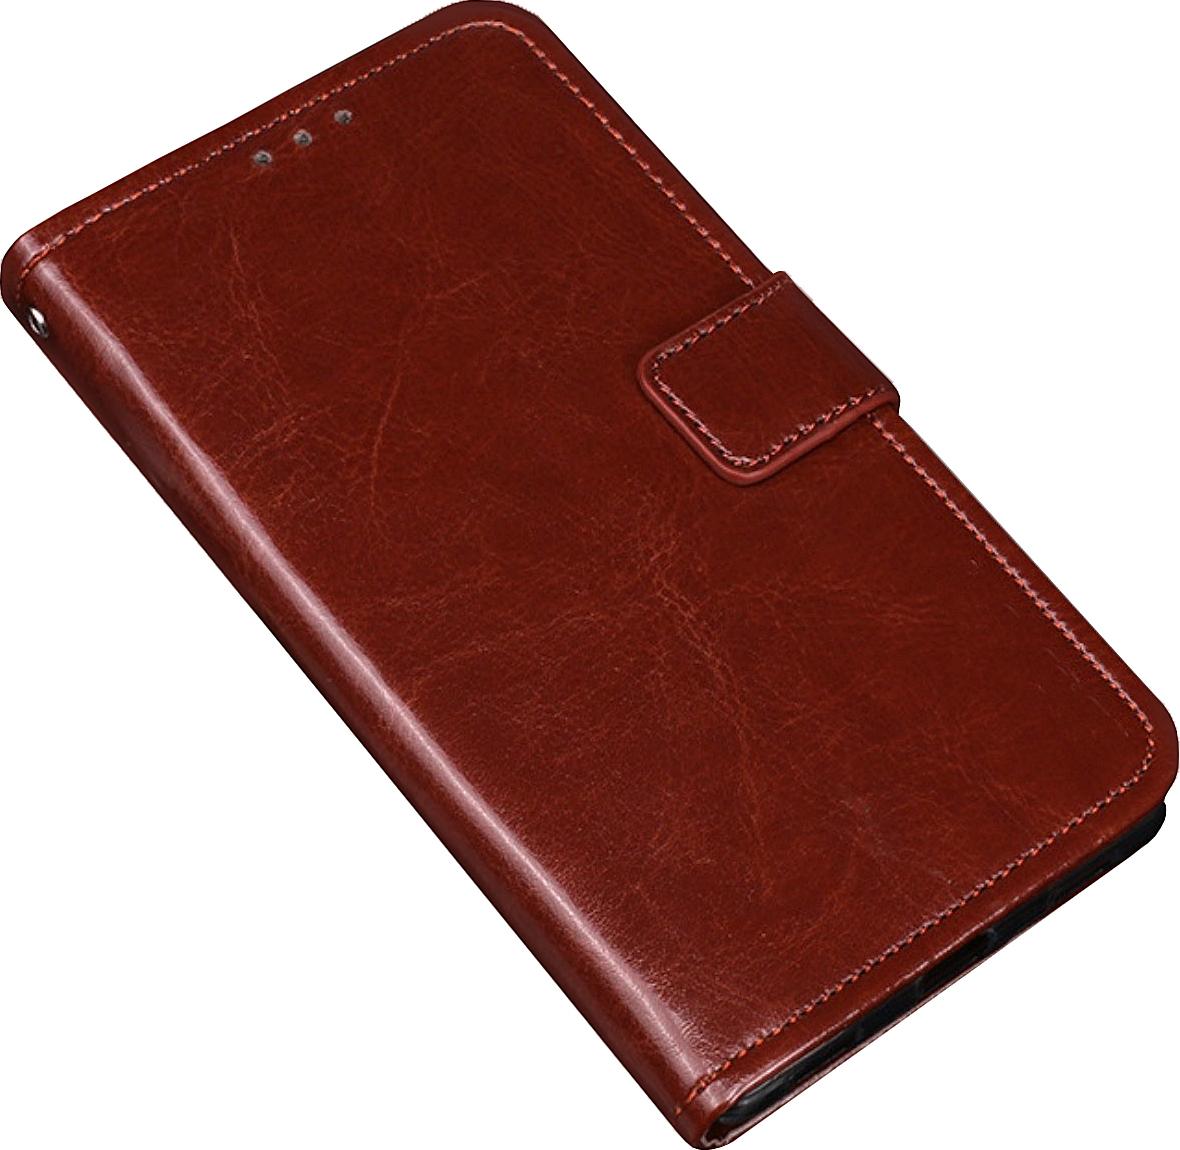 Чехол-книжка MyPads для Huawei Mediapad X2 с мульти-подставкой застёжкой и визитницей коричневый